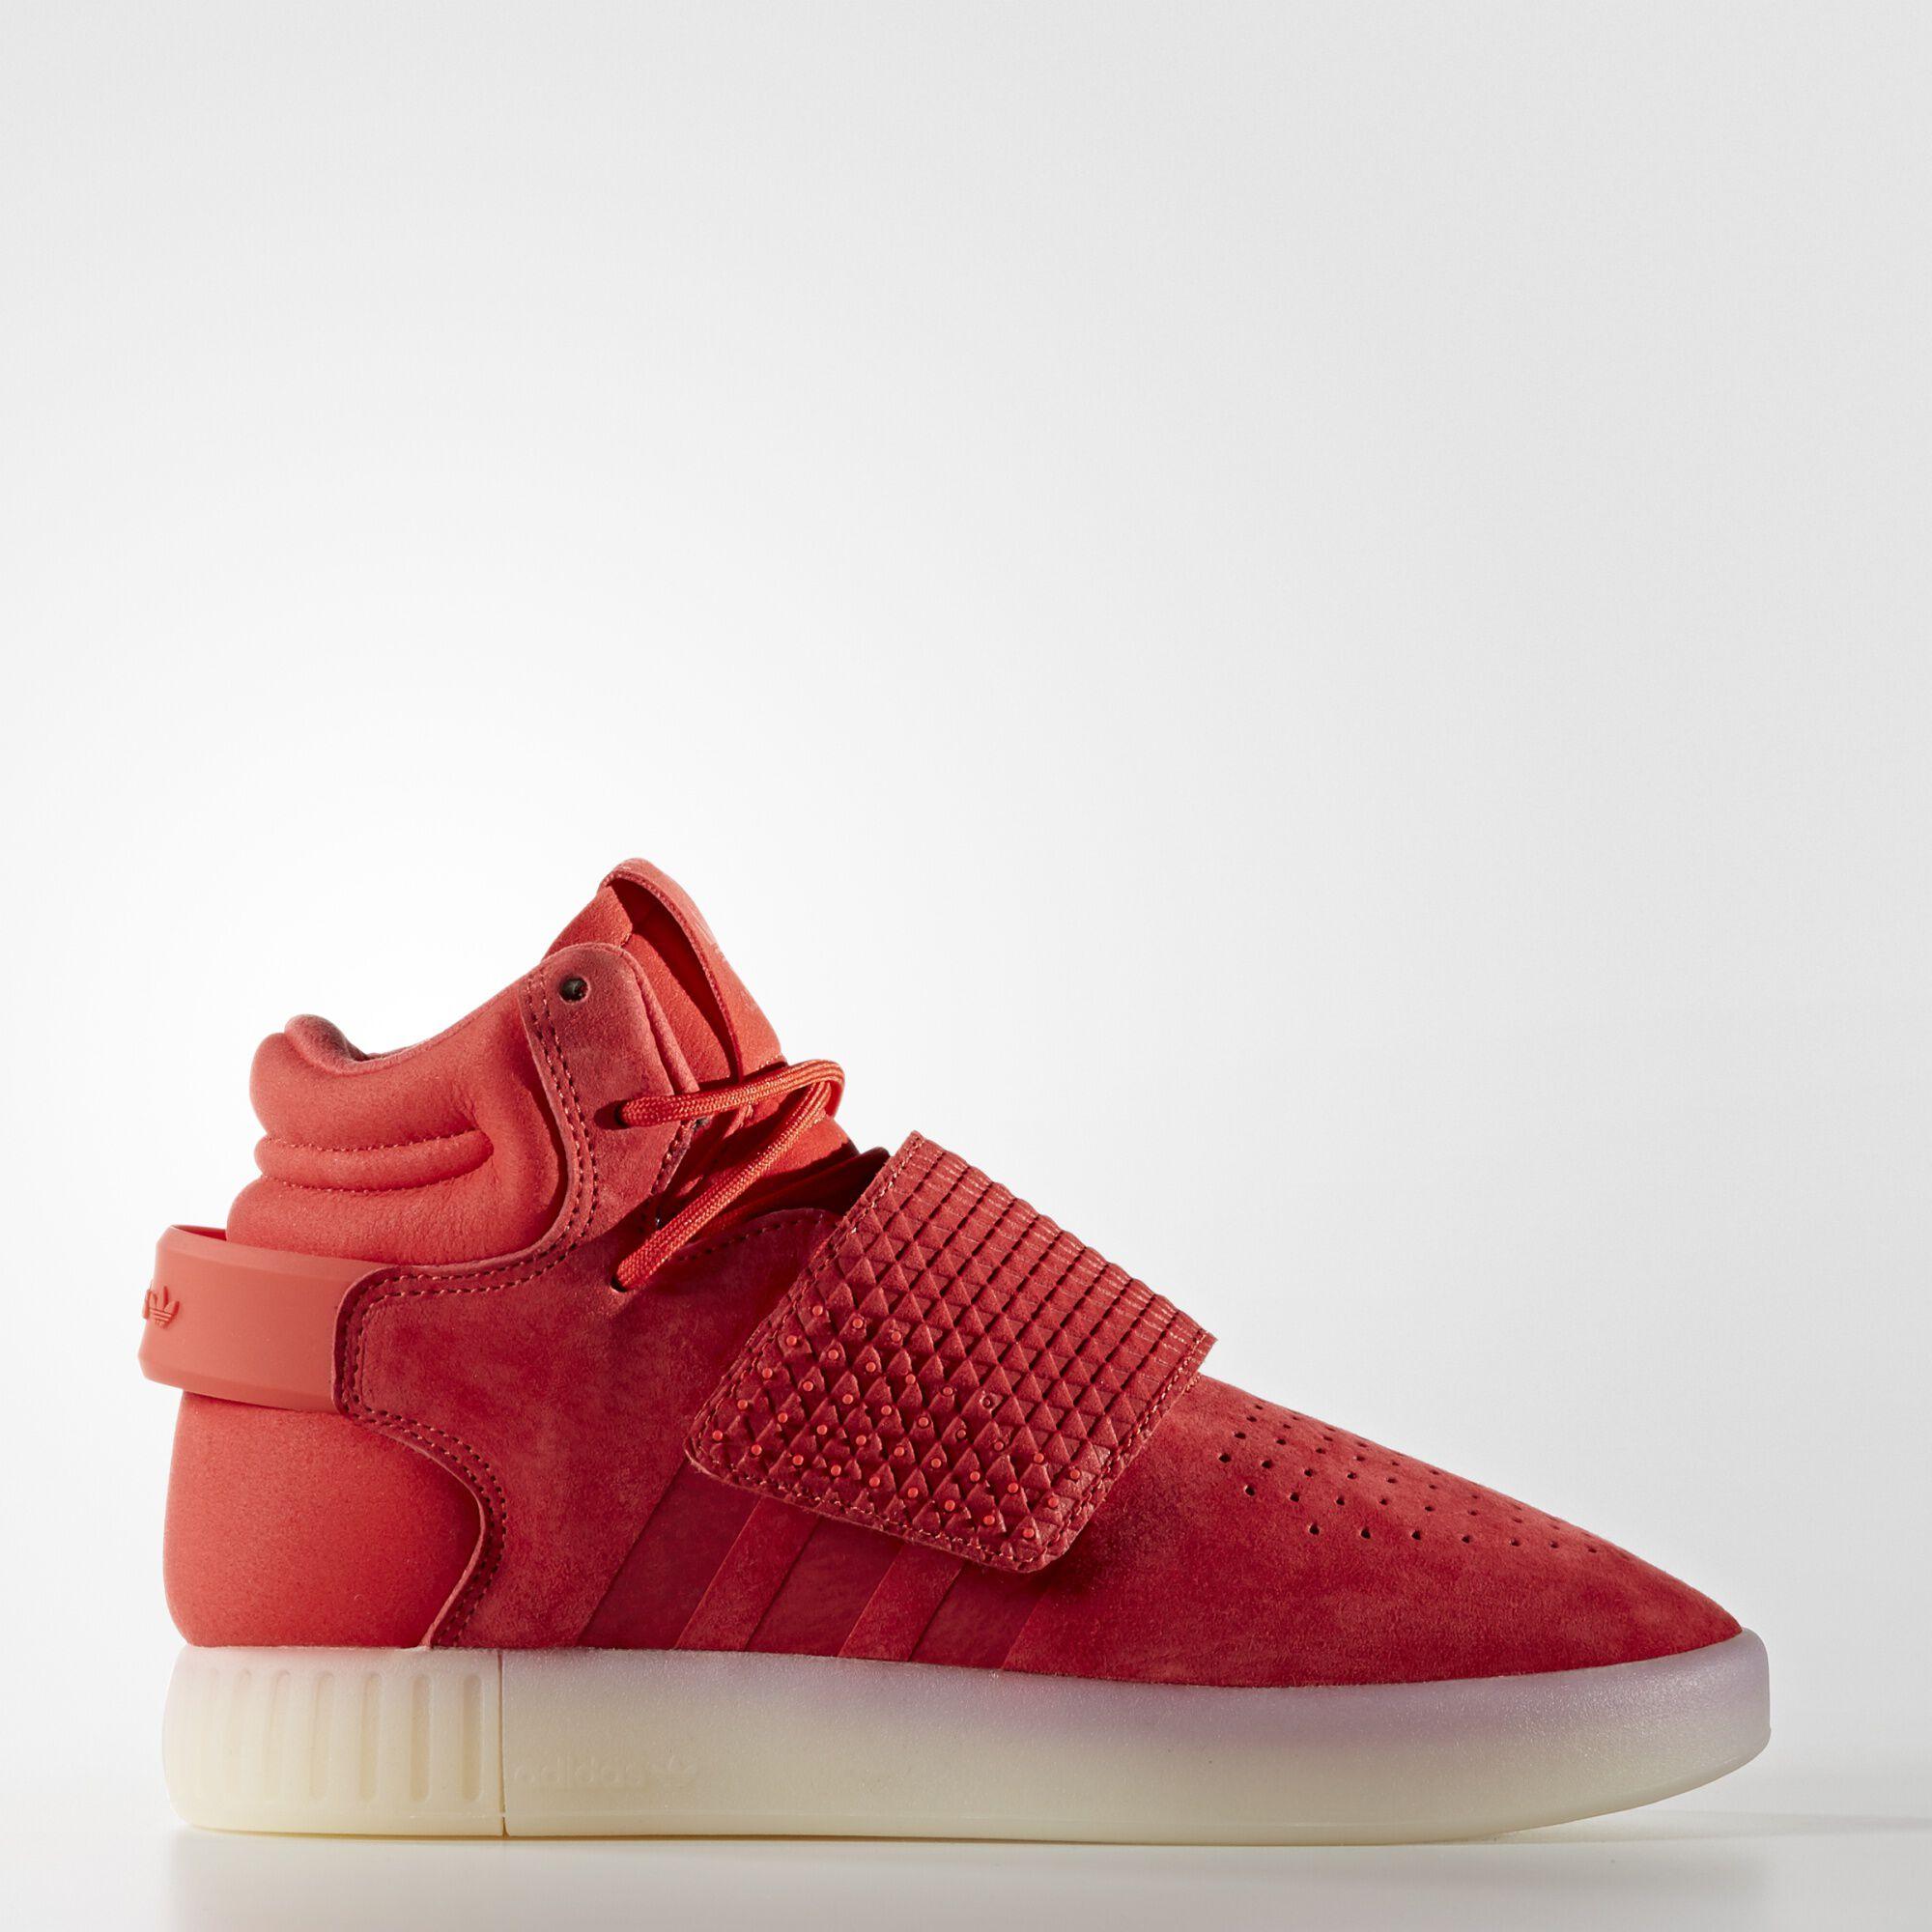 adidas uk vente adidas d rose dominent 2016 hommes au basket baskets